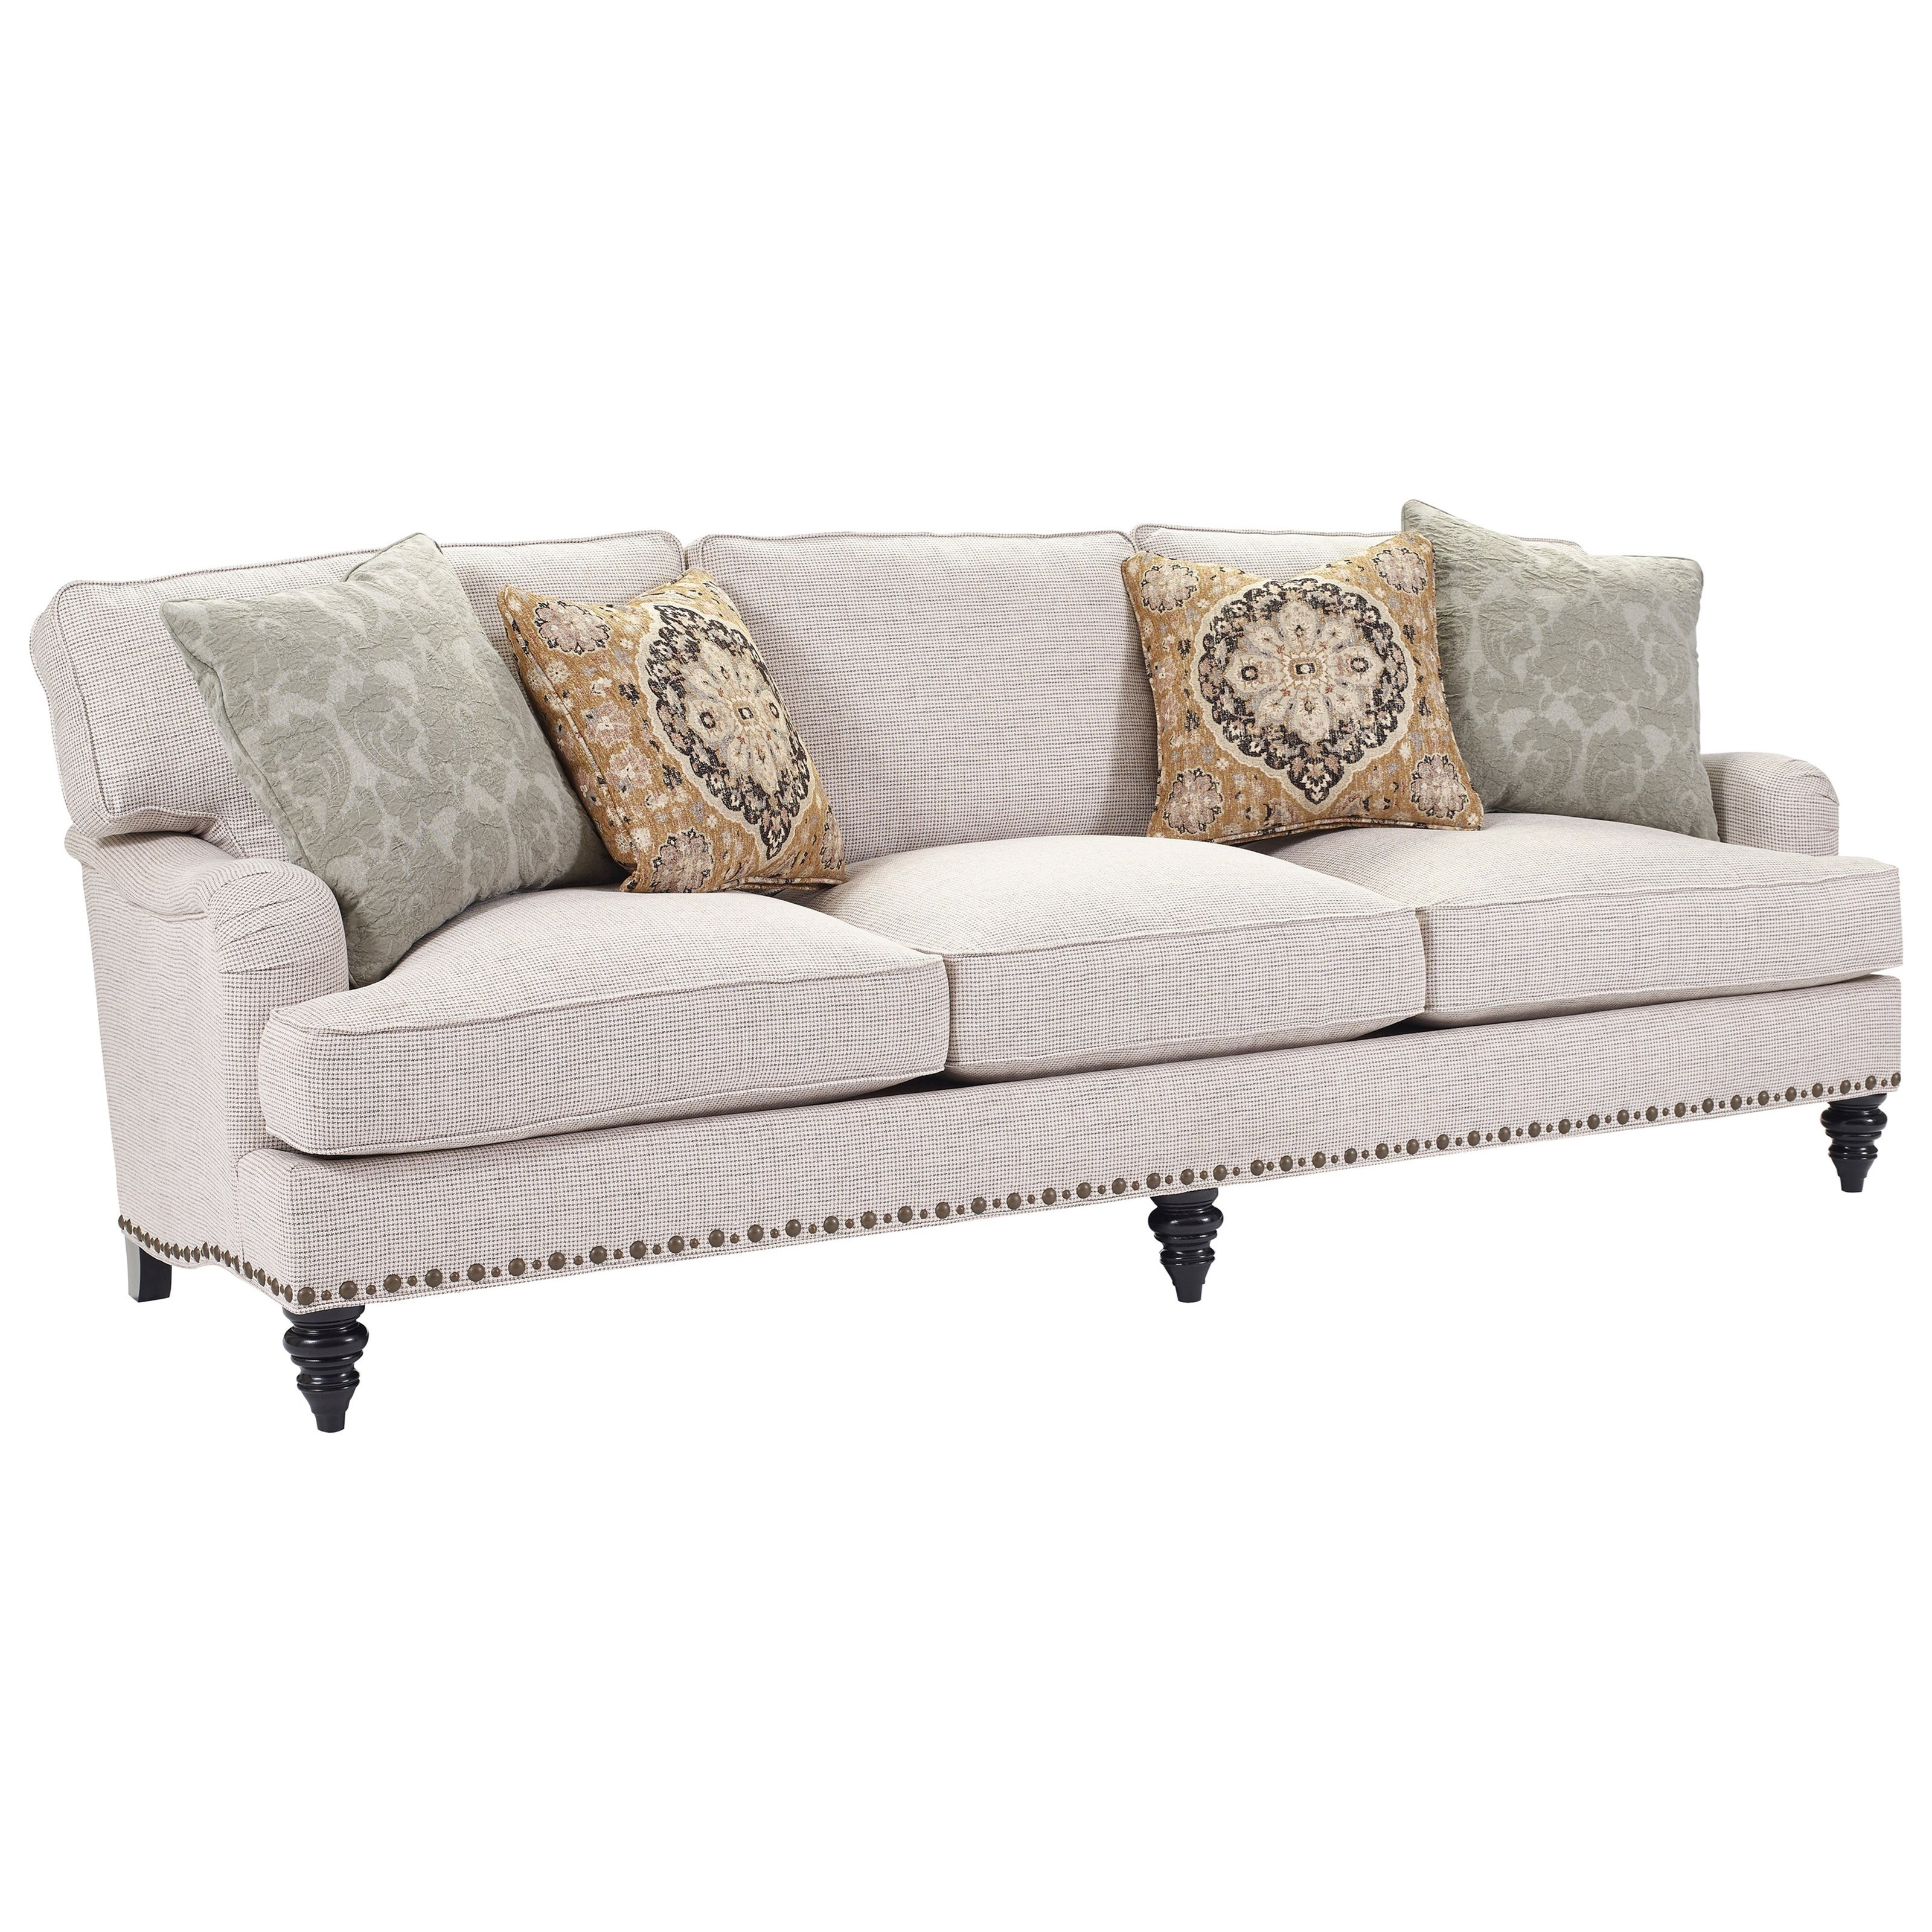 Unique Sofas: Sofa Broyhill Broyhill Furniture Ester 4283 3 Traditional